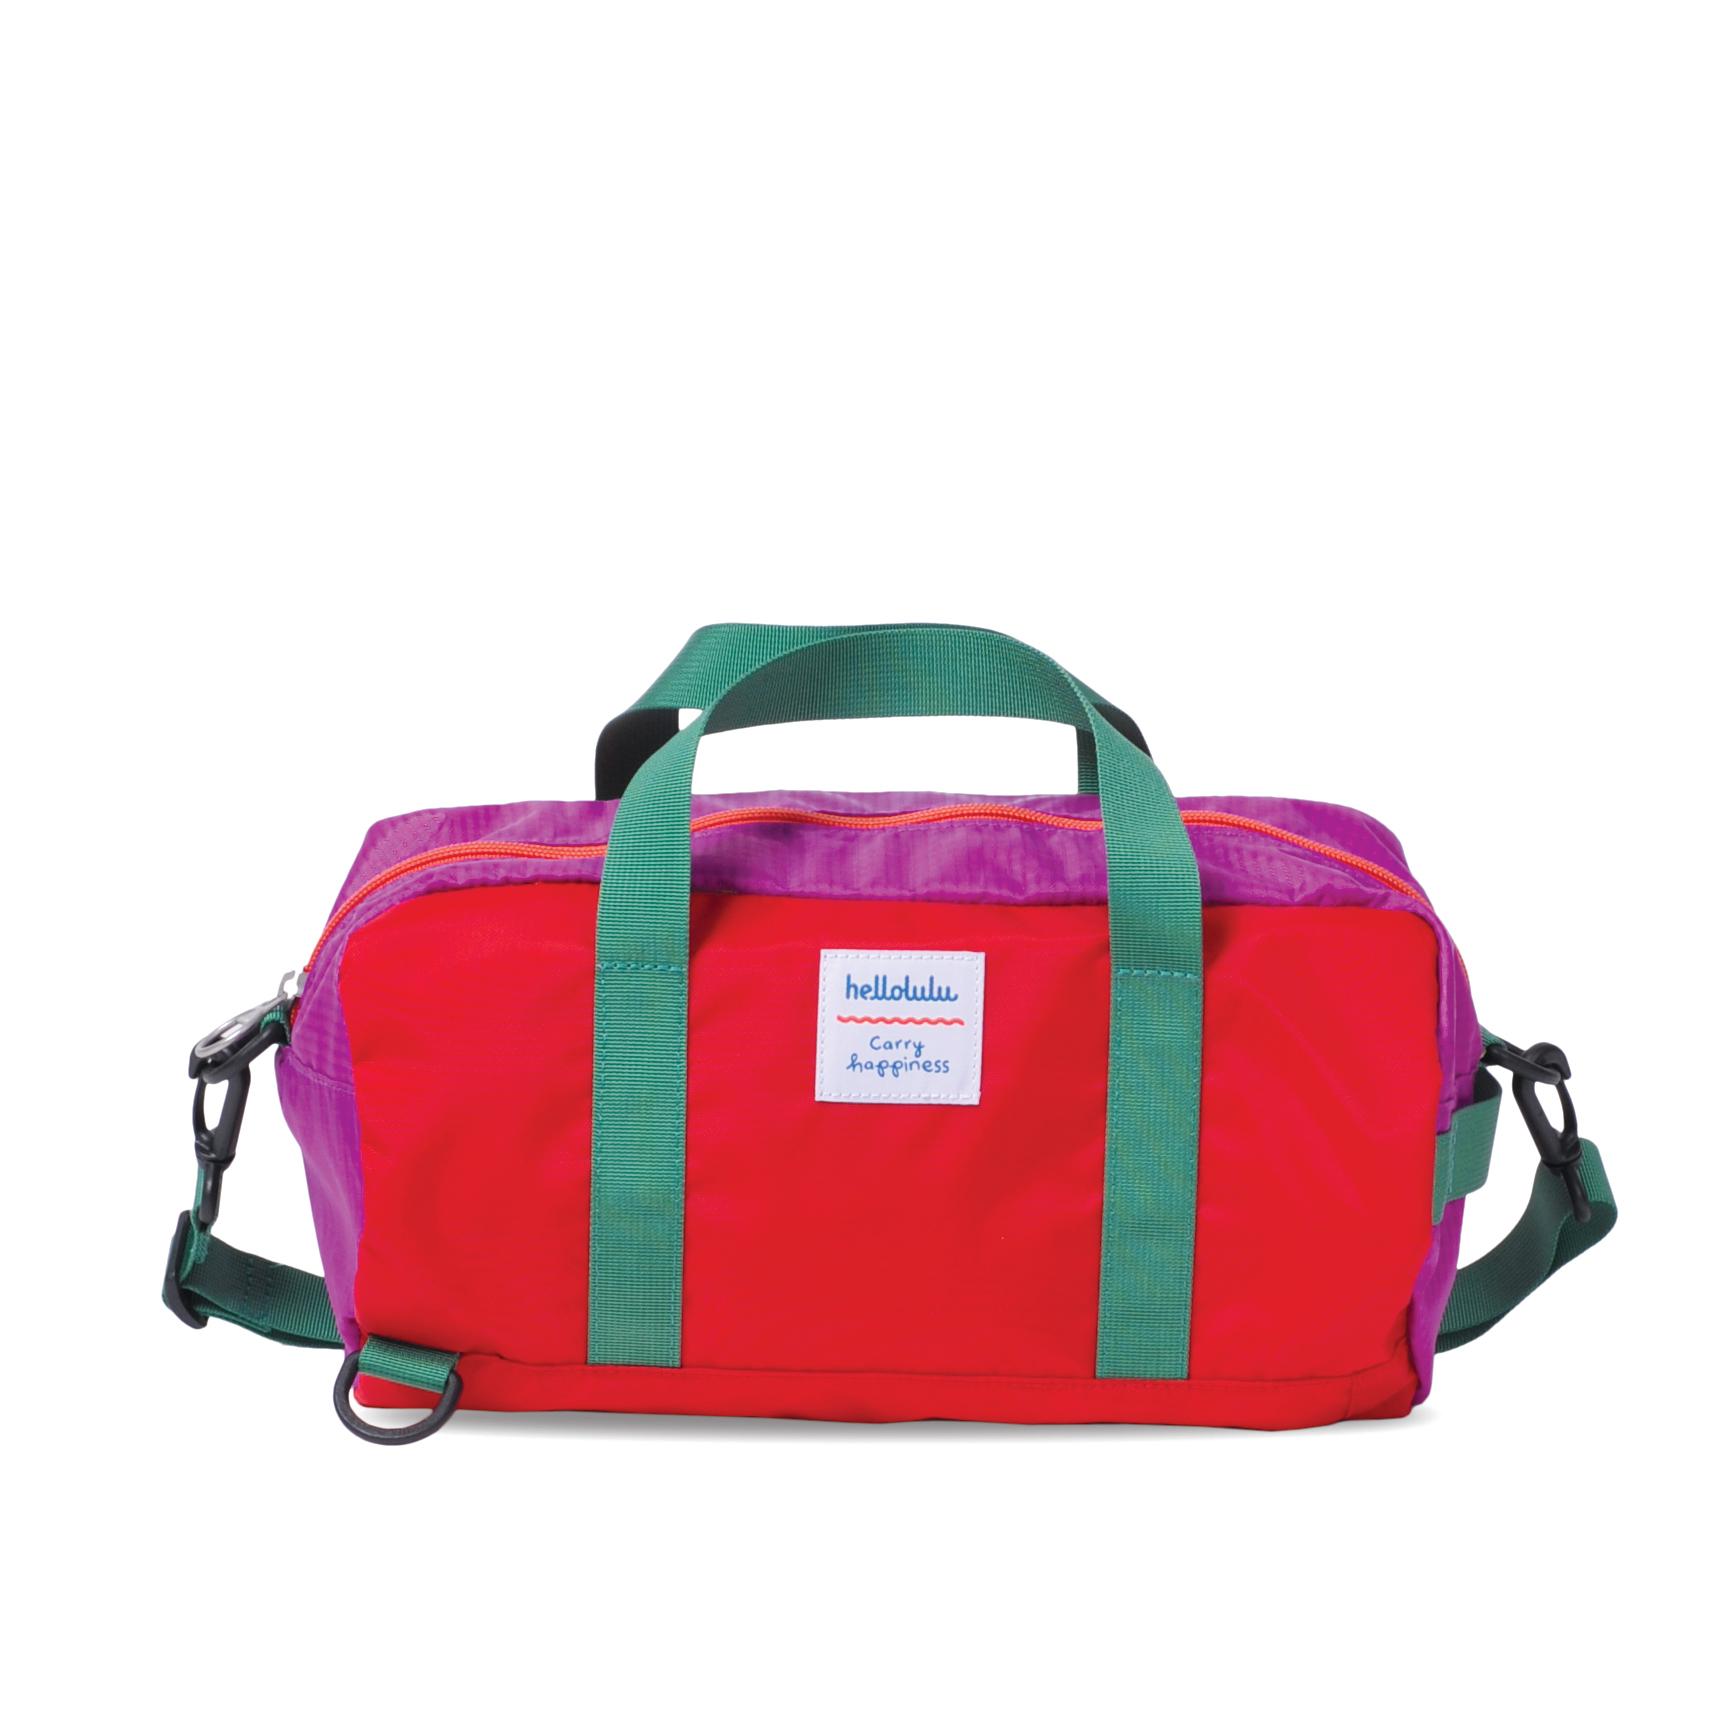 Hellolulu กระเป๋าเด็ก รุ่น BOBO - Red/Purple